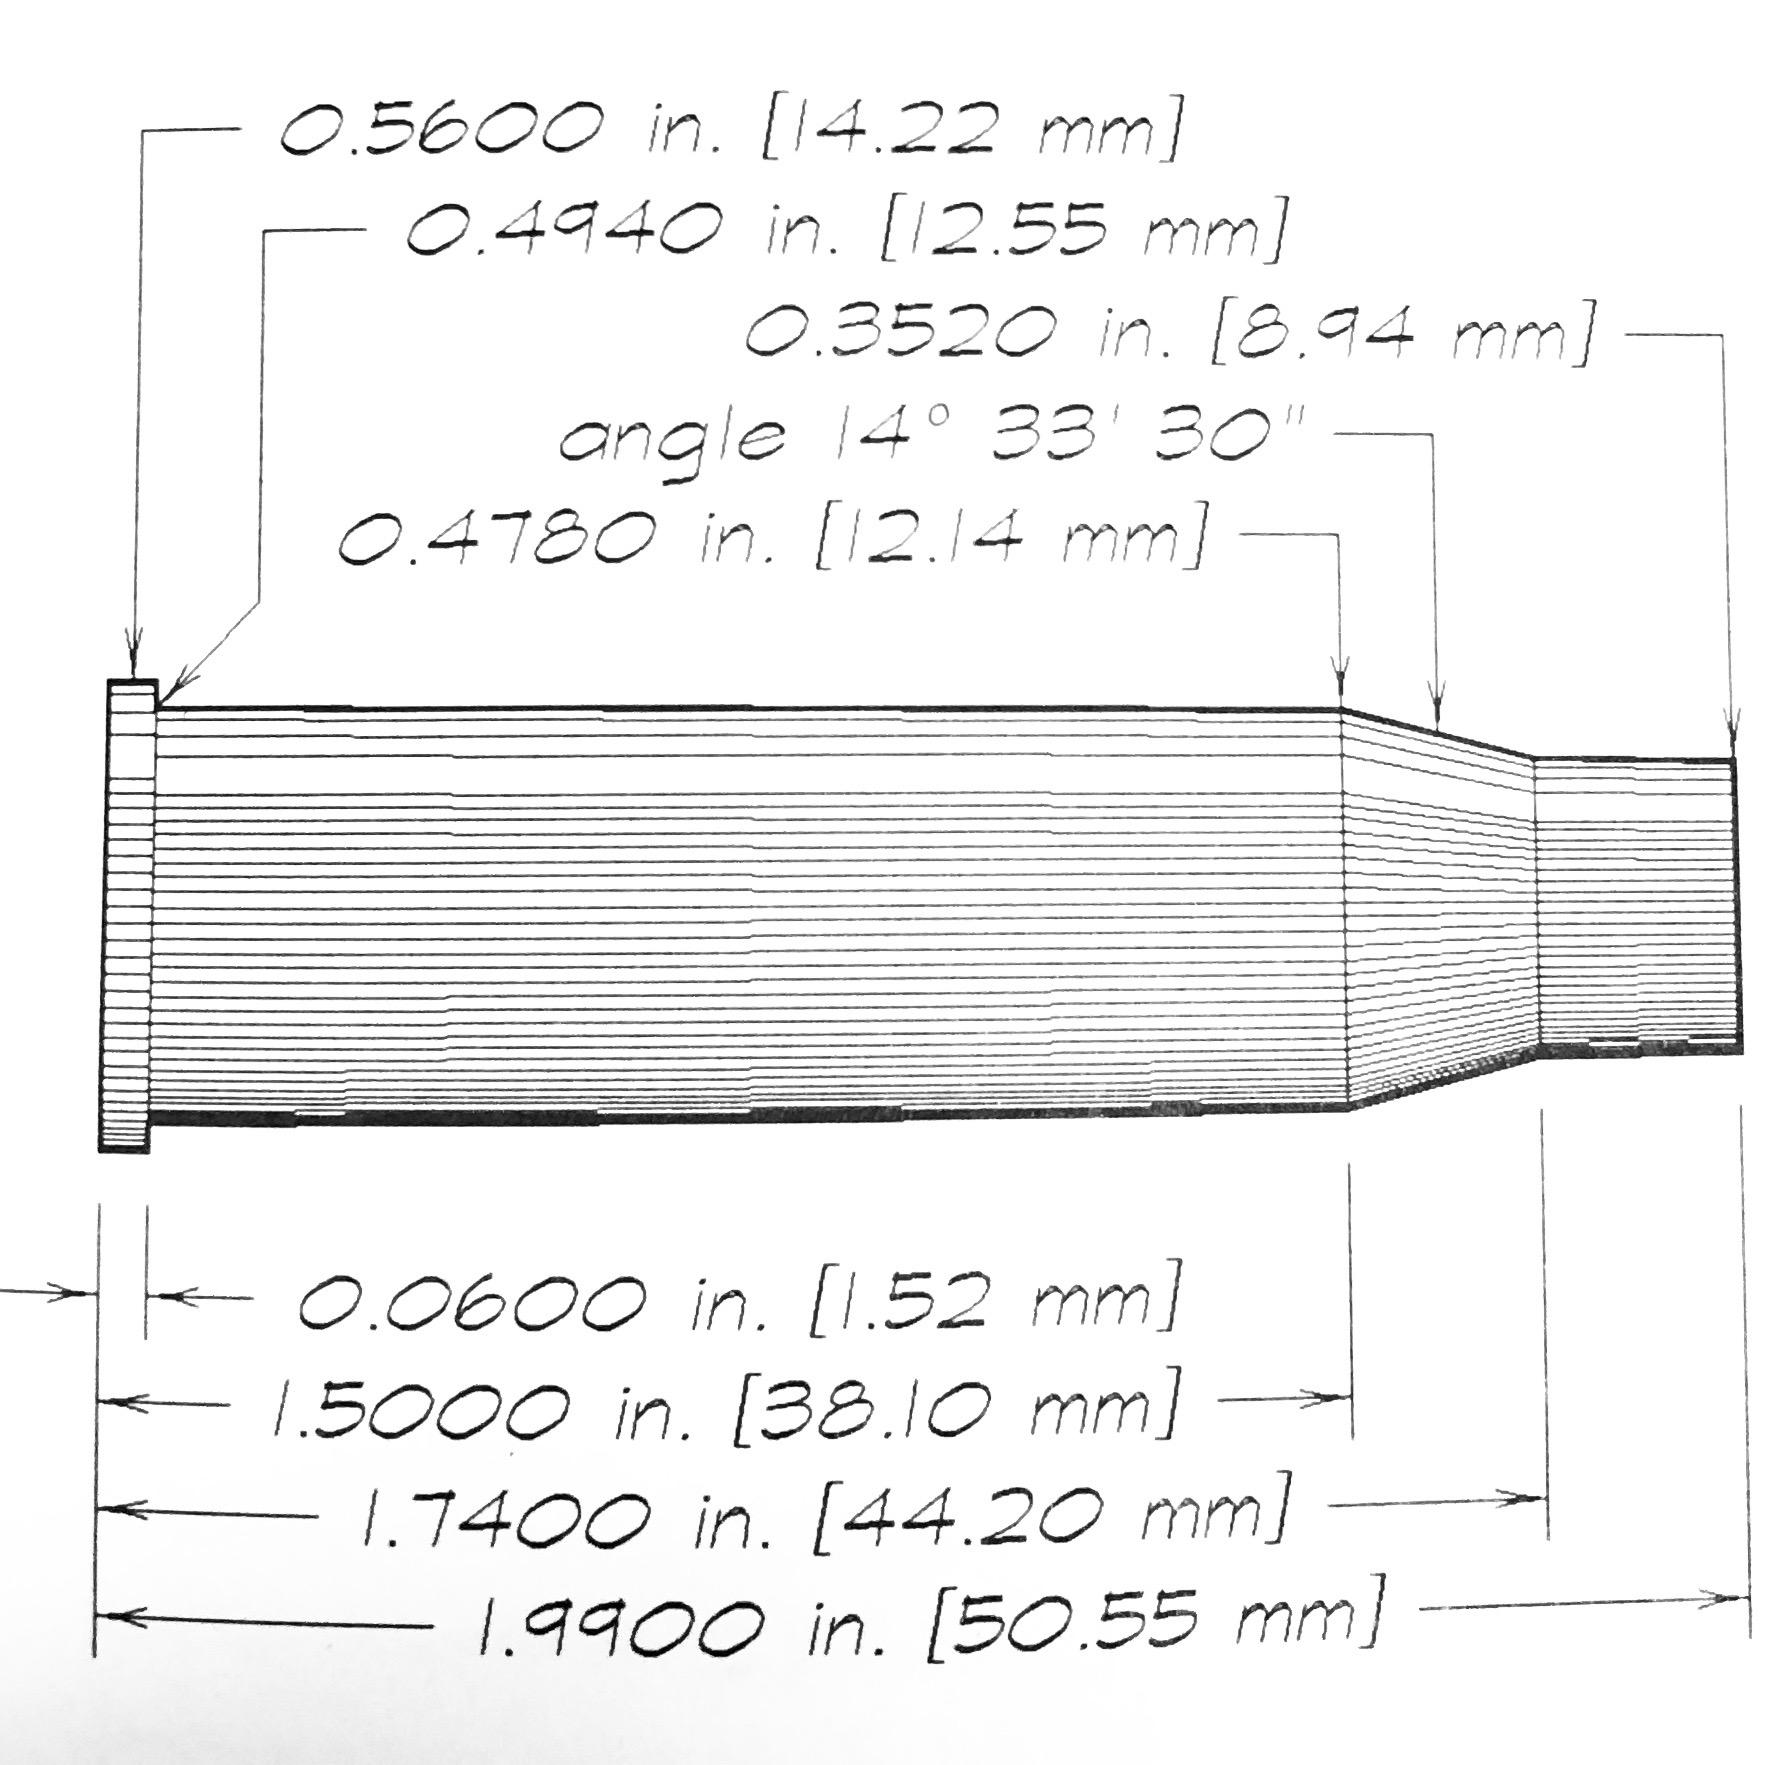 IMG-1151.JPG